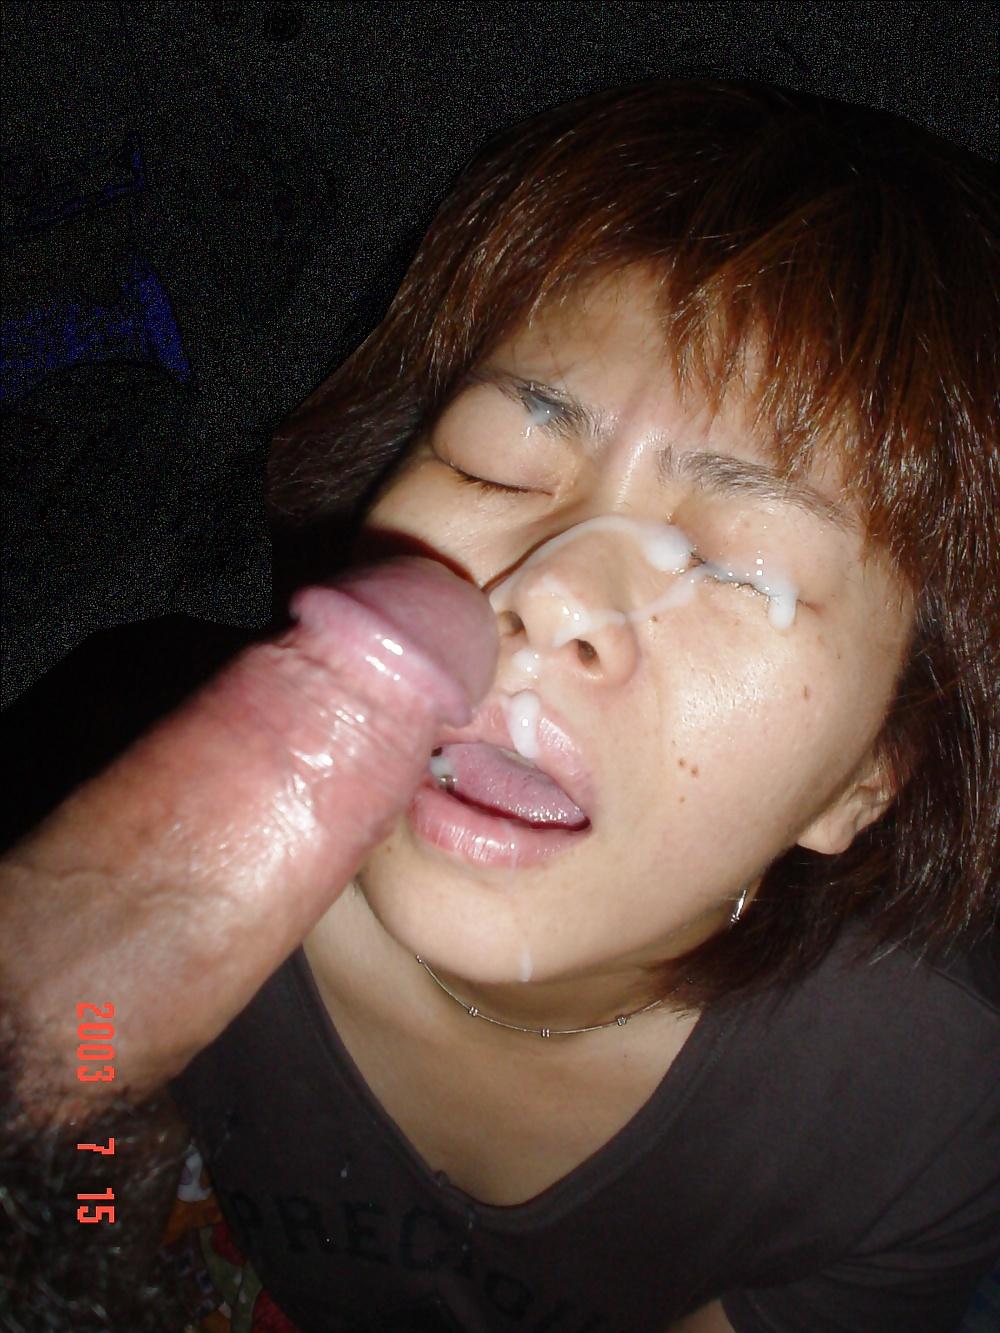 Japanese wife sucking, free hairy gay sex orgies